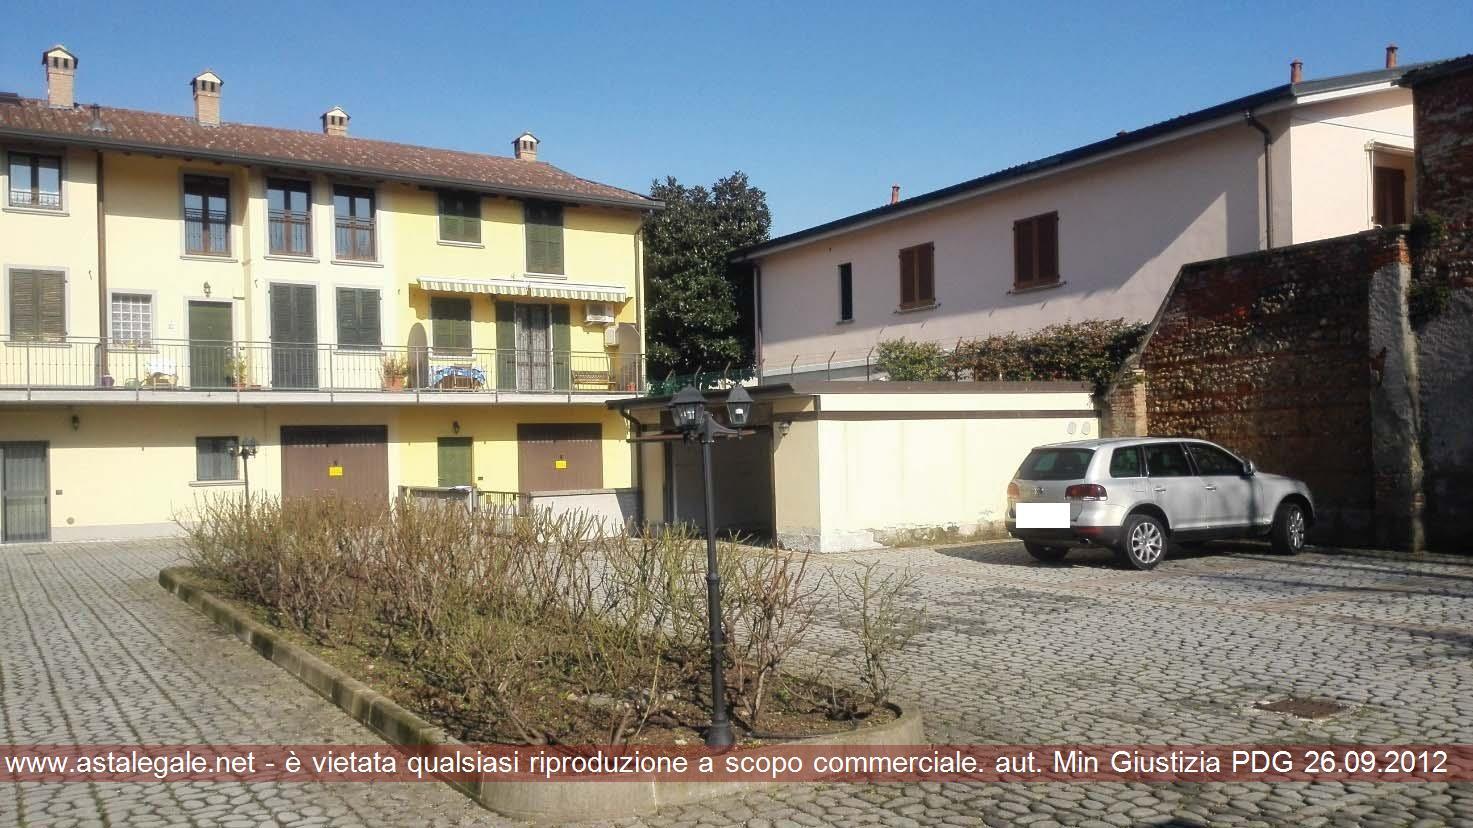 Pozzuolo Martesana (MI) Via Martiri Libertà/ Via Valsecchi Giovanni 65/9